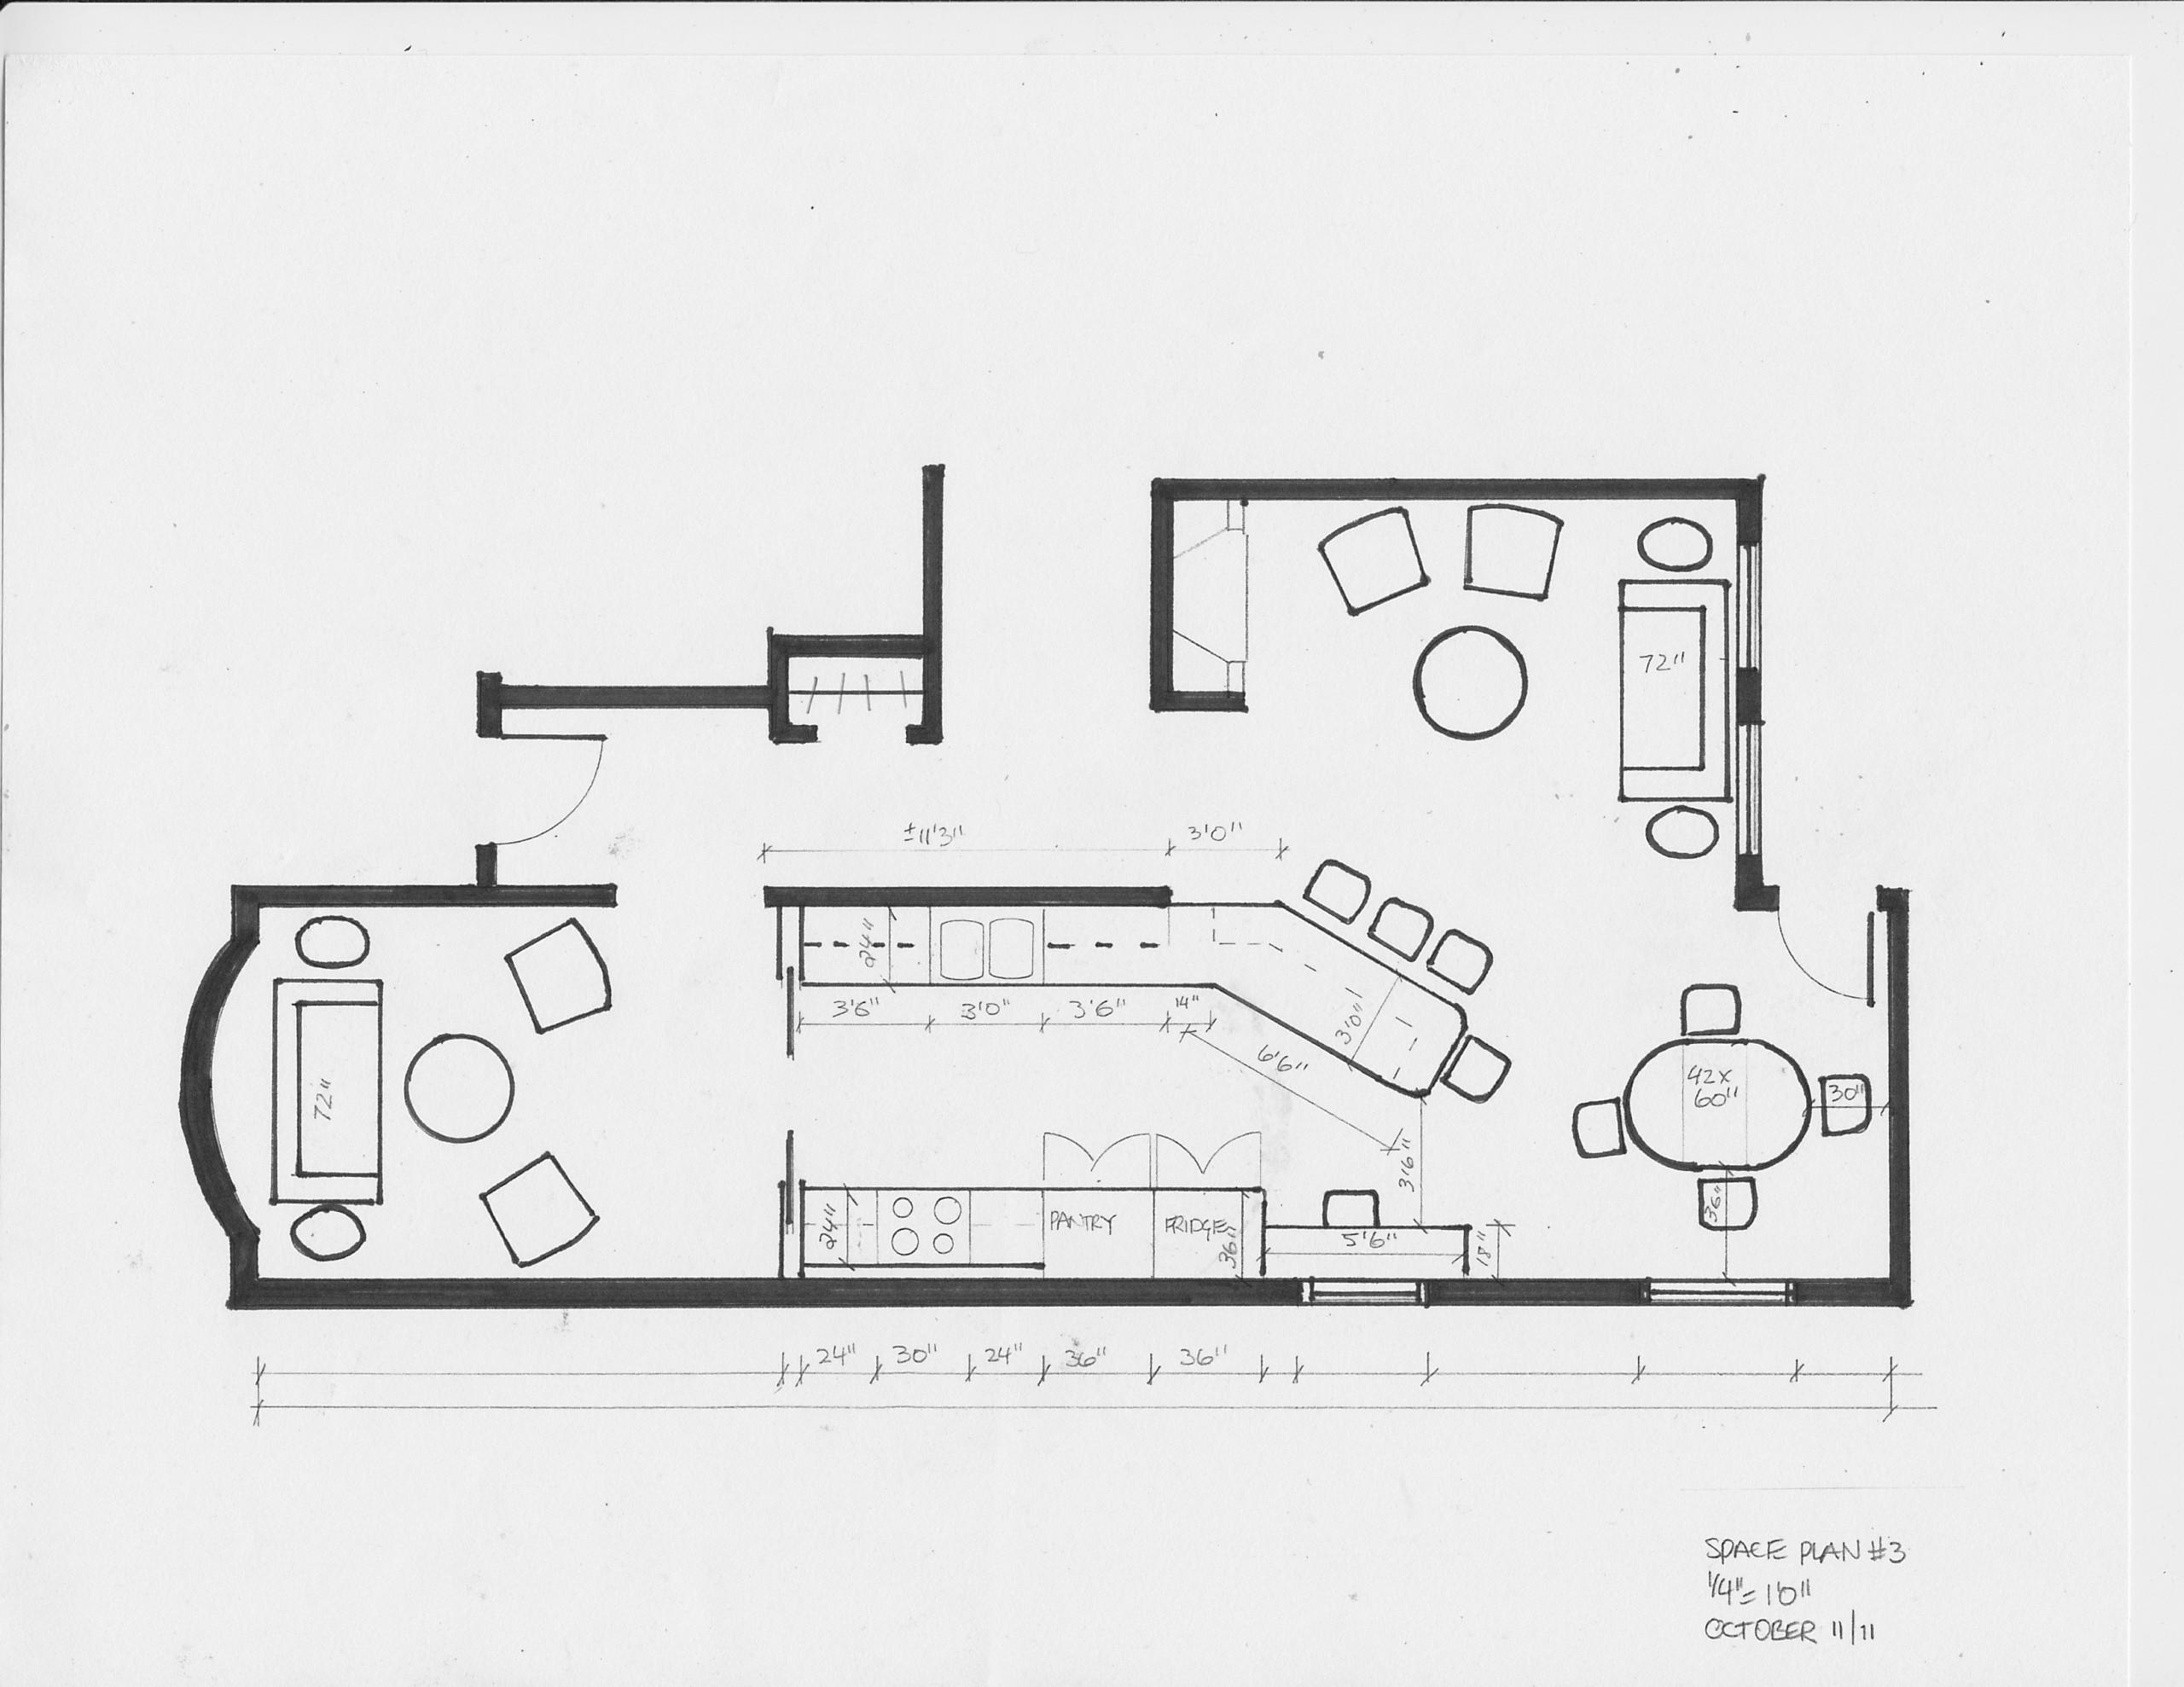 residential space plans- kingston main floor space plan